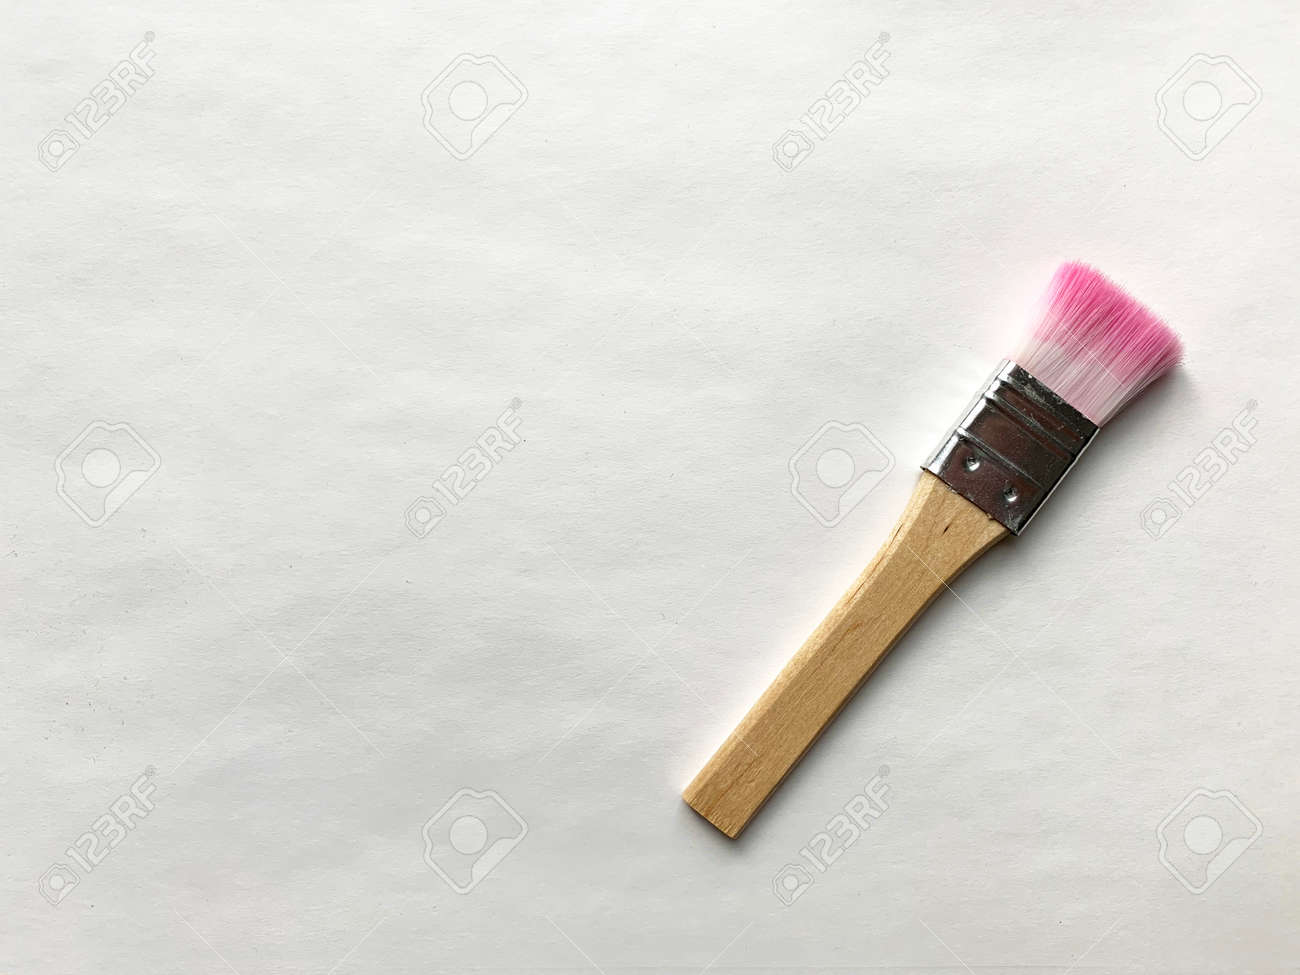 Art brush on white background. - 169603118